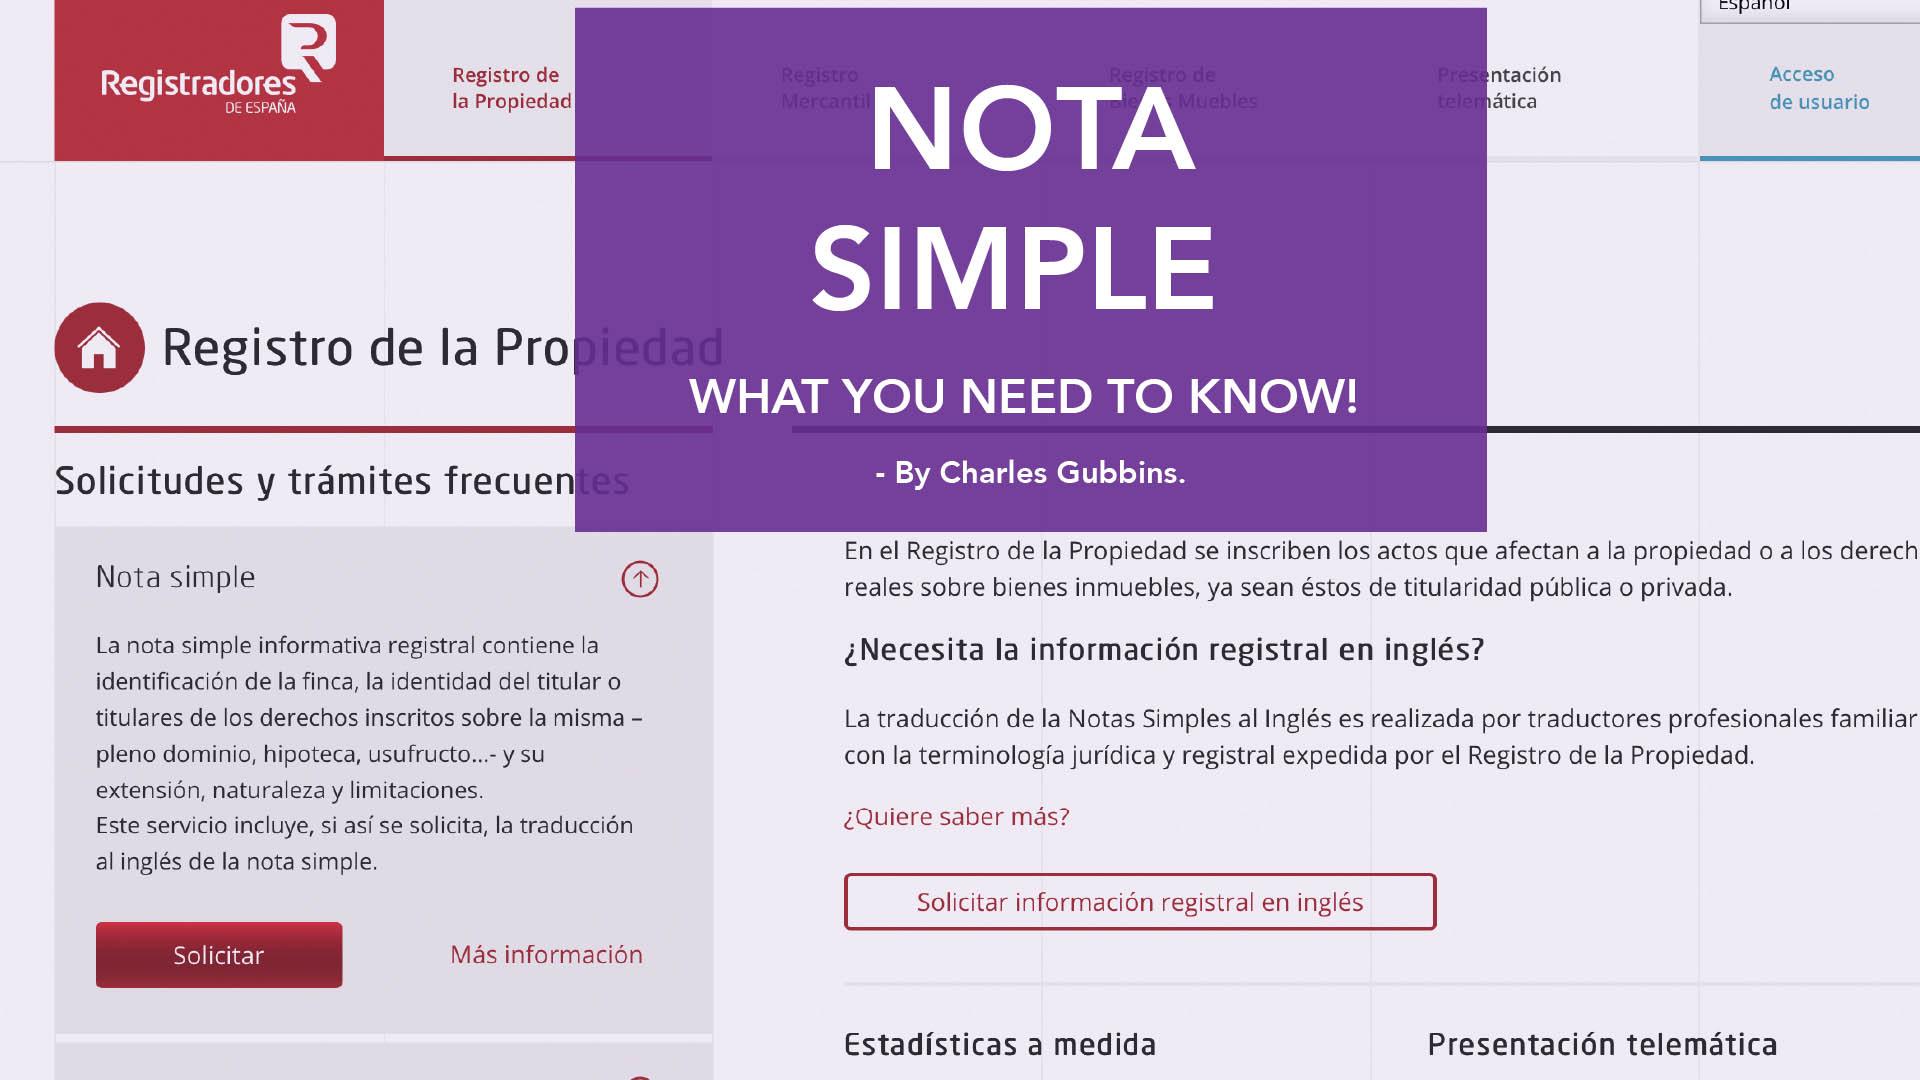 nota-simple-charles-gubbins-noll-sotogrande-real-estate-blog-2021